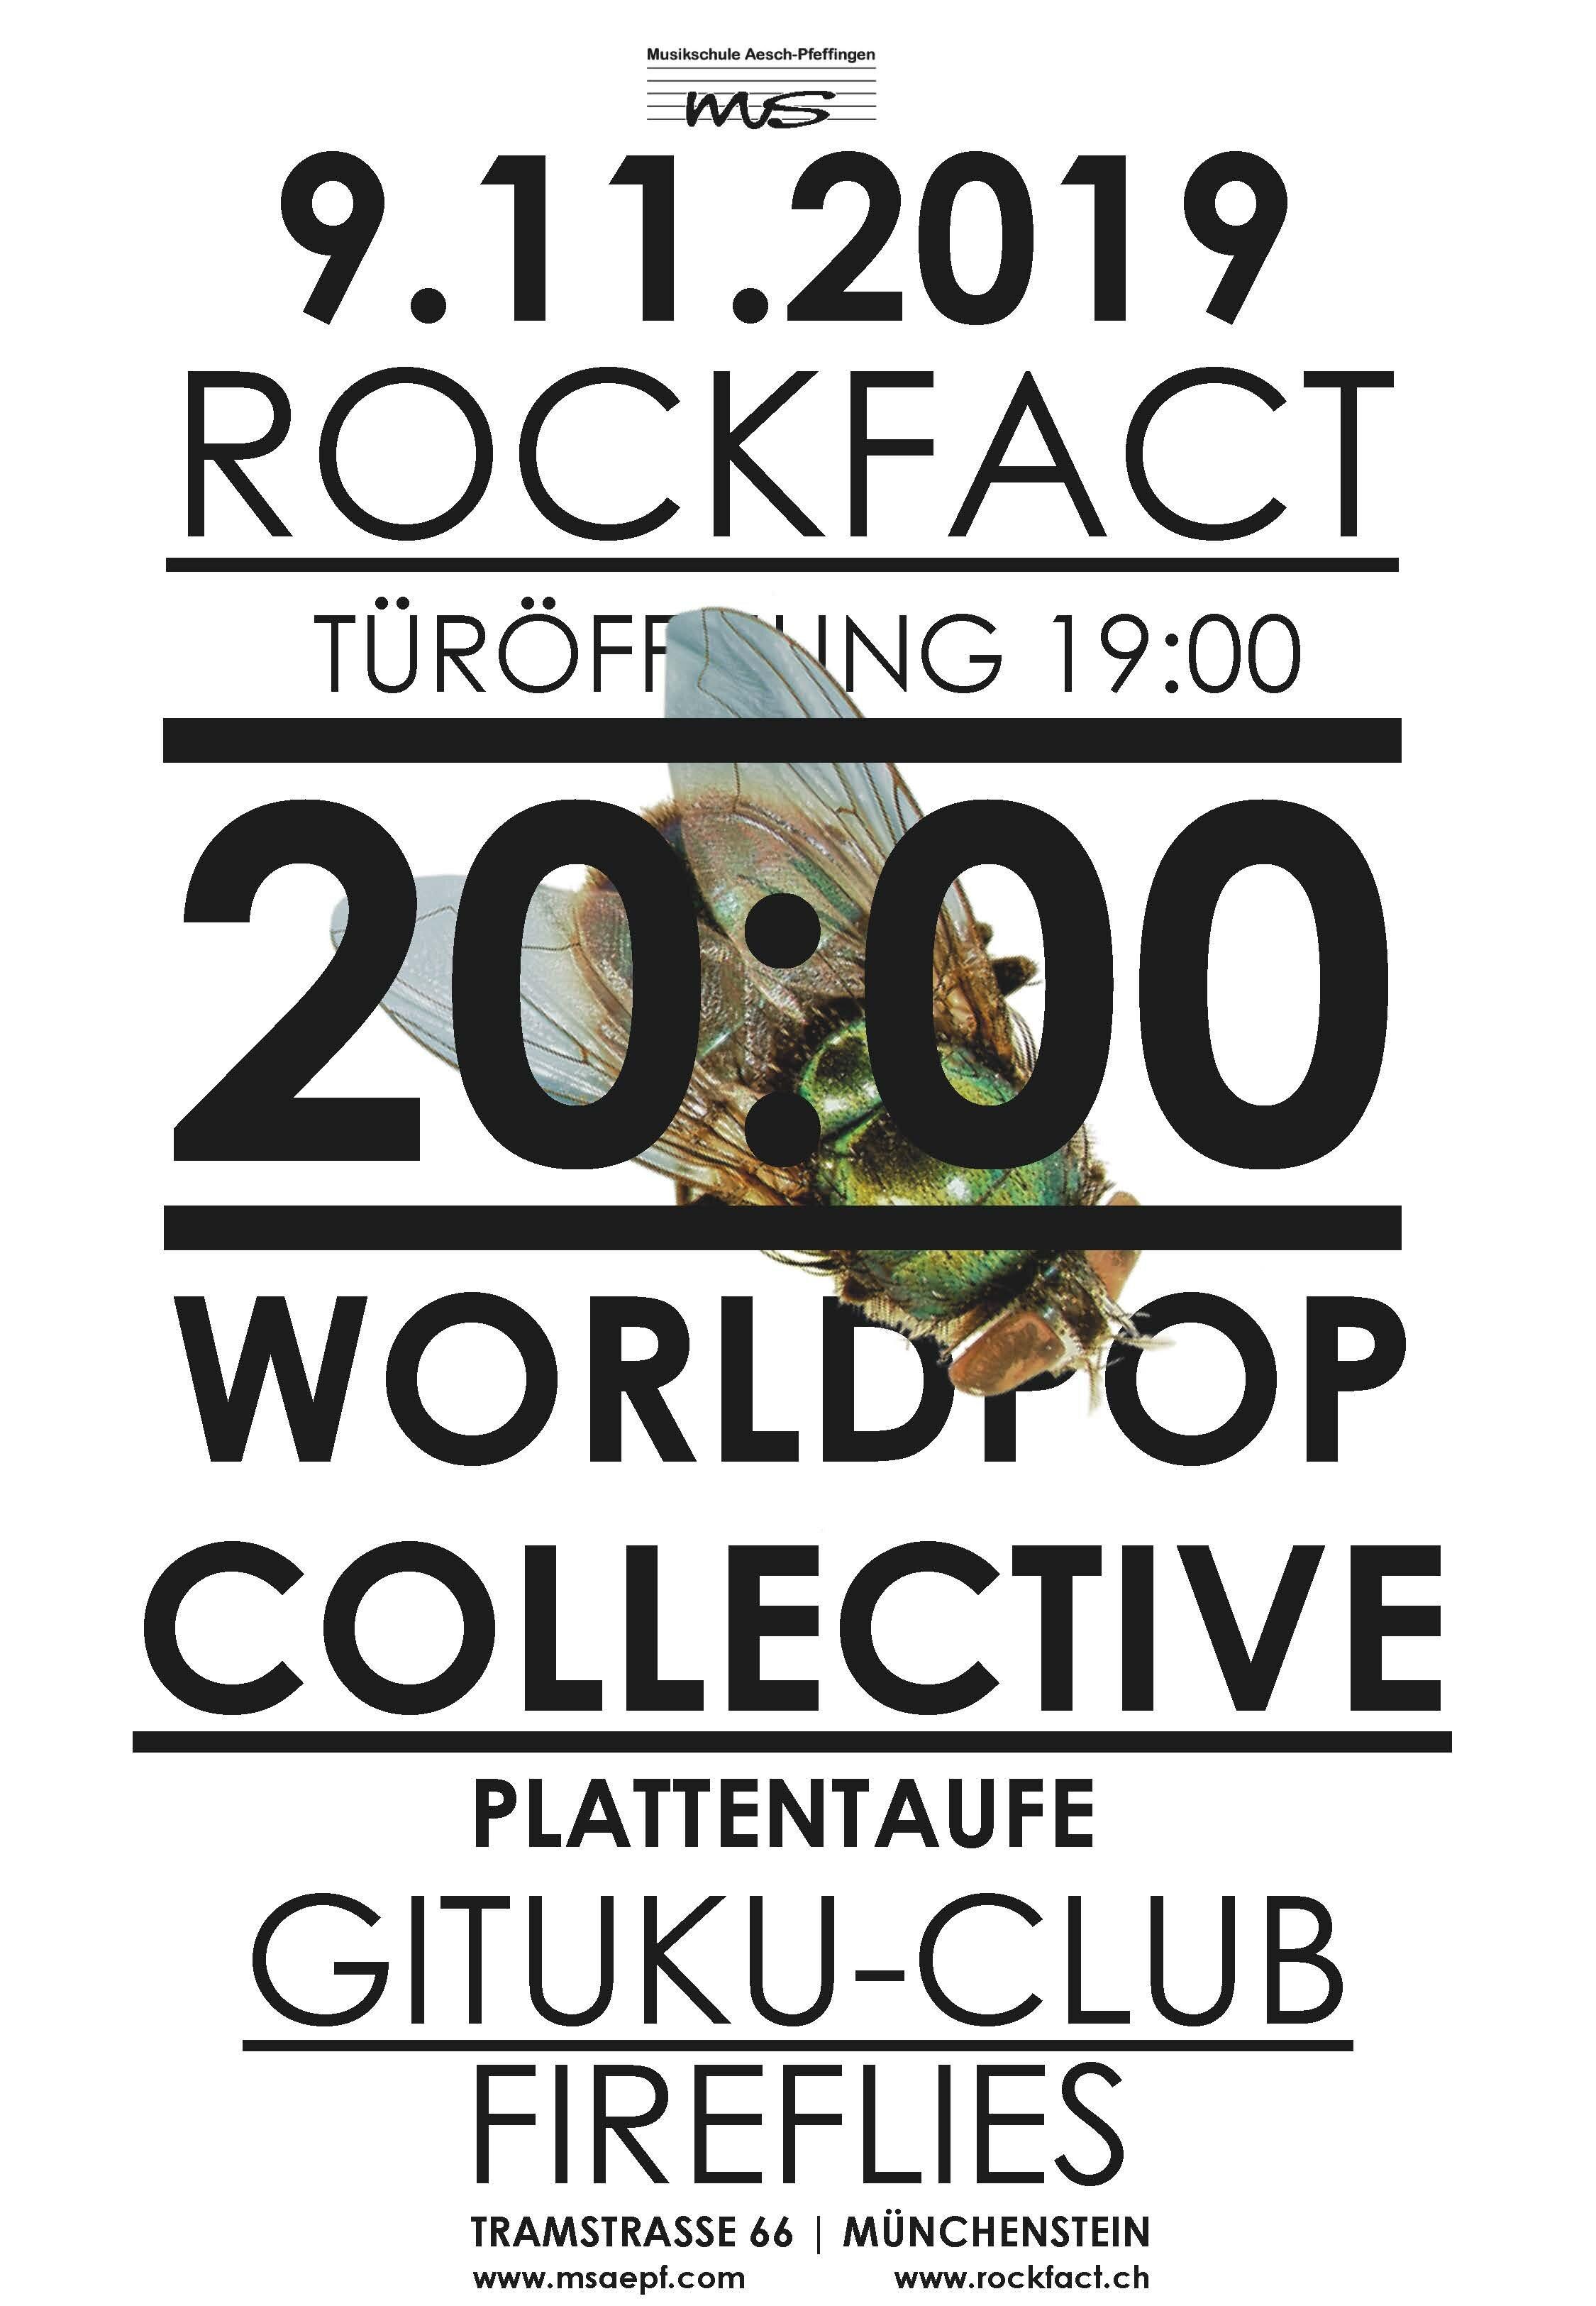 world-pop-collective.jpg